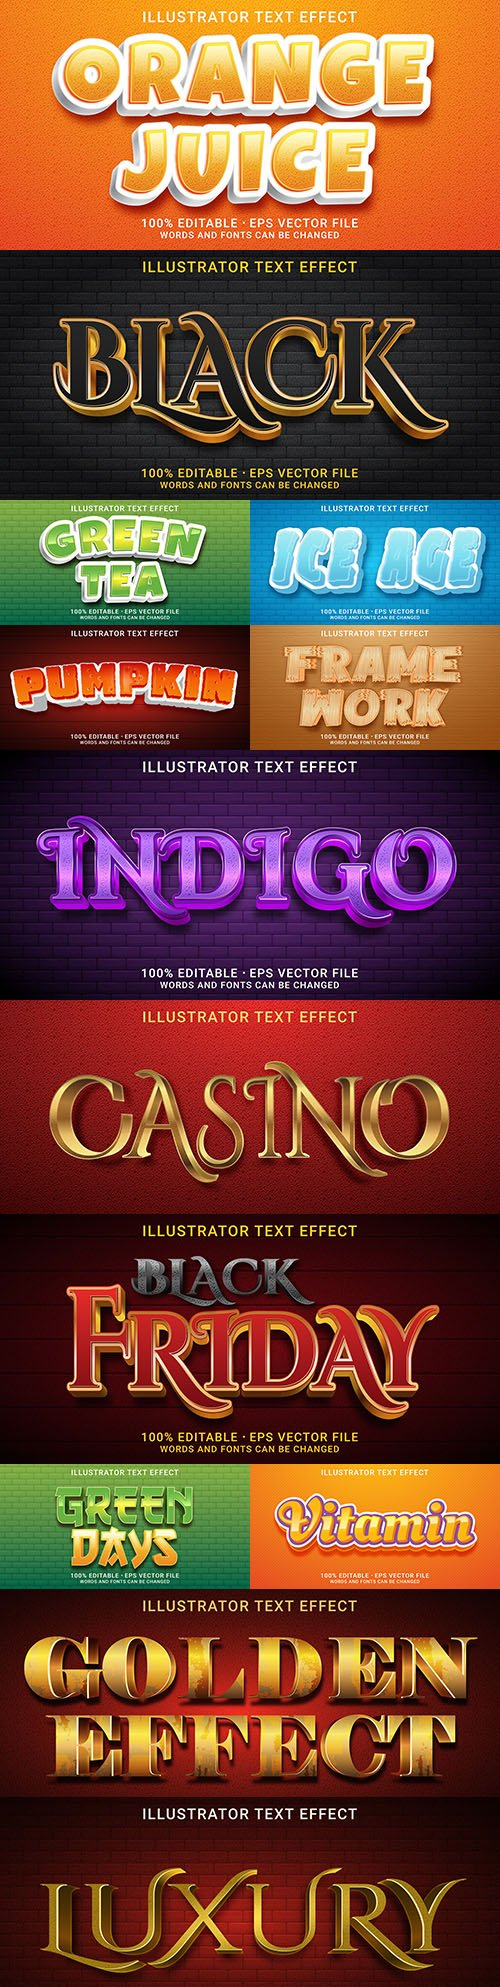 Editable font effect text collection illustration design 222